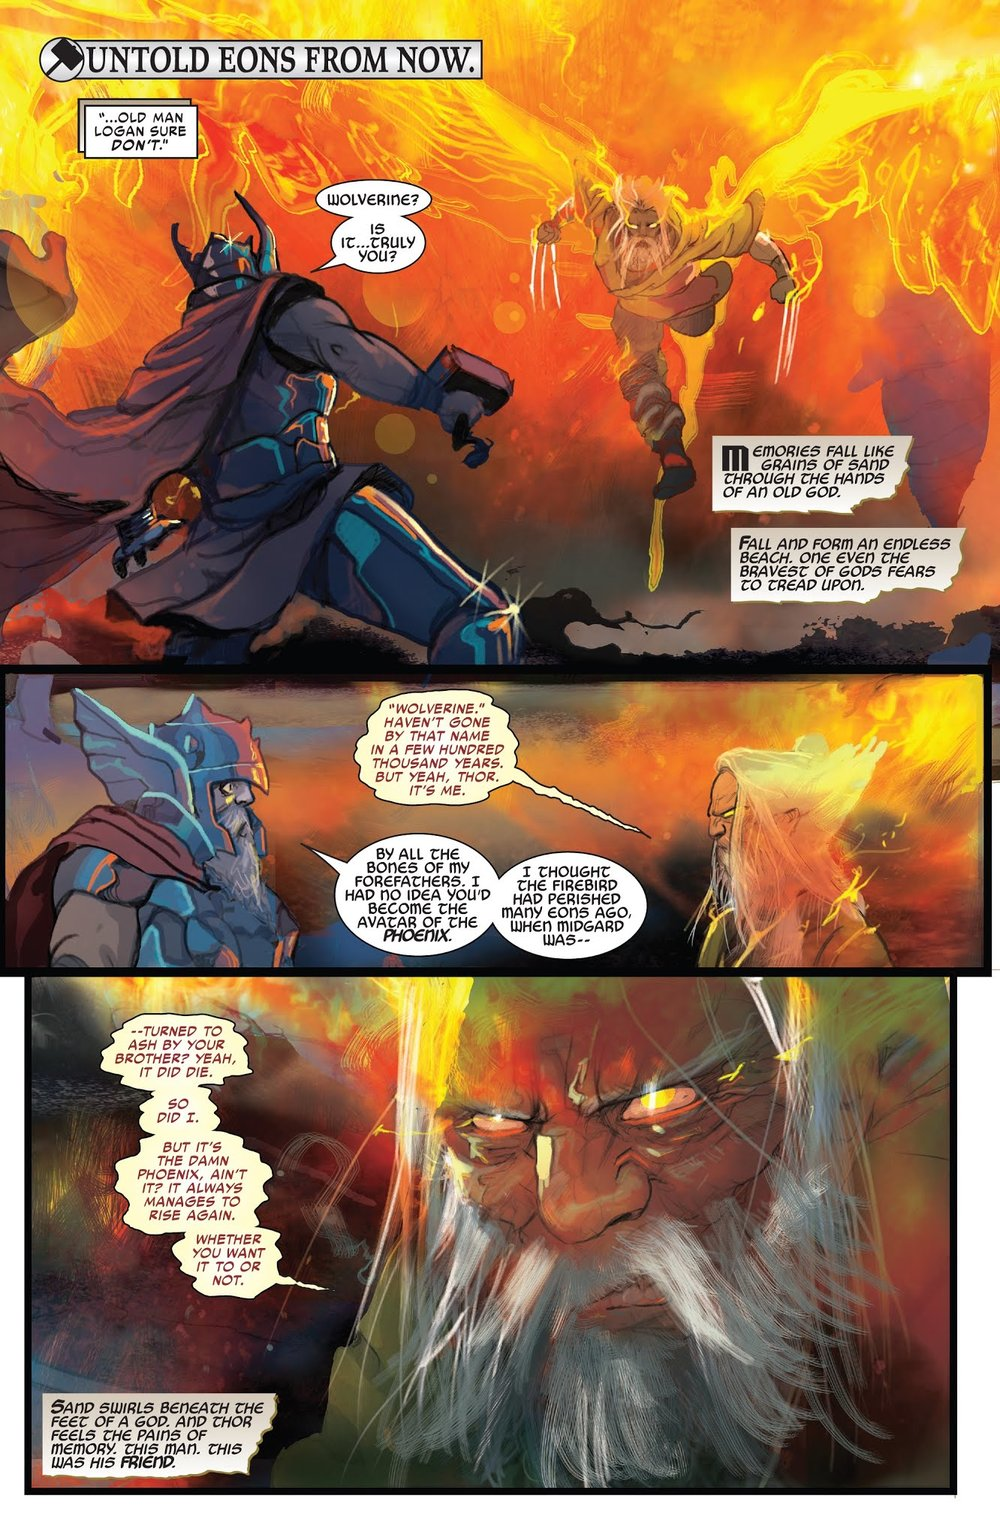 Thor2.jpg